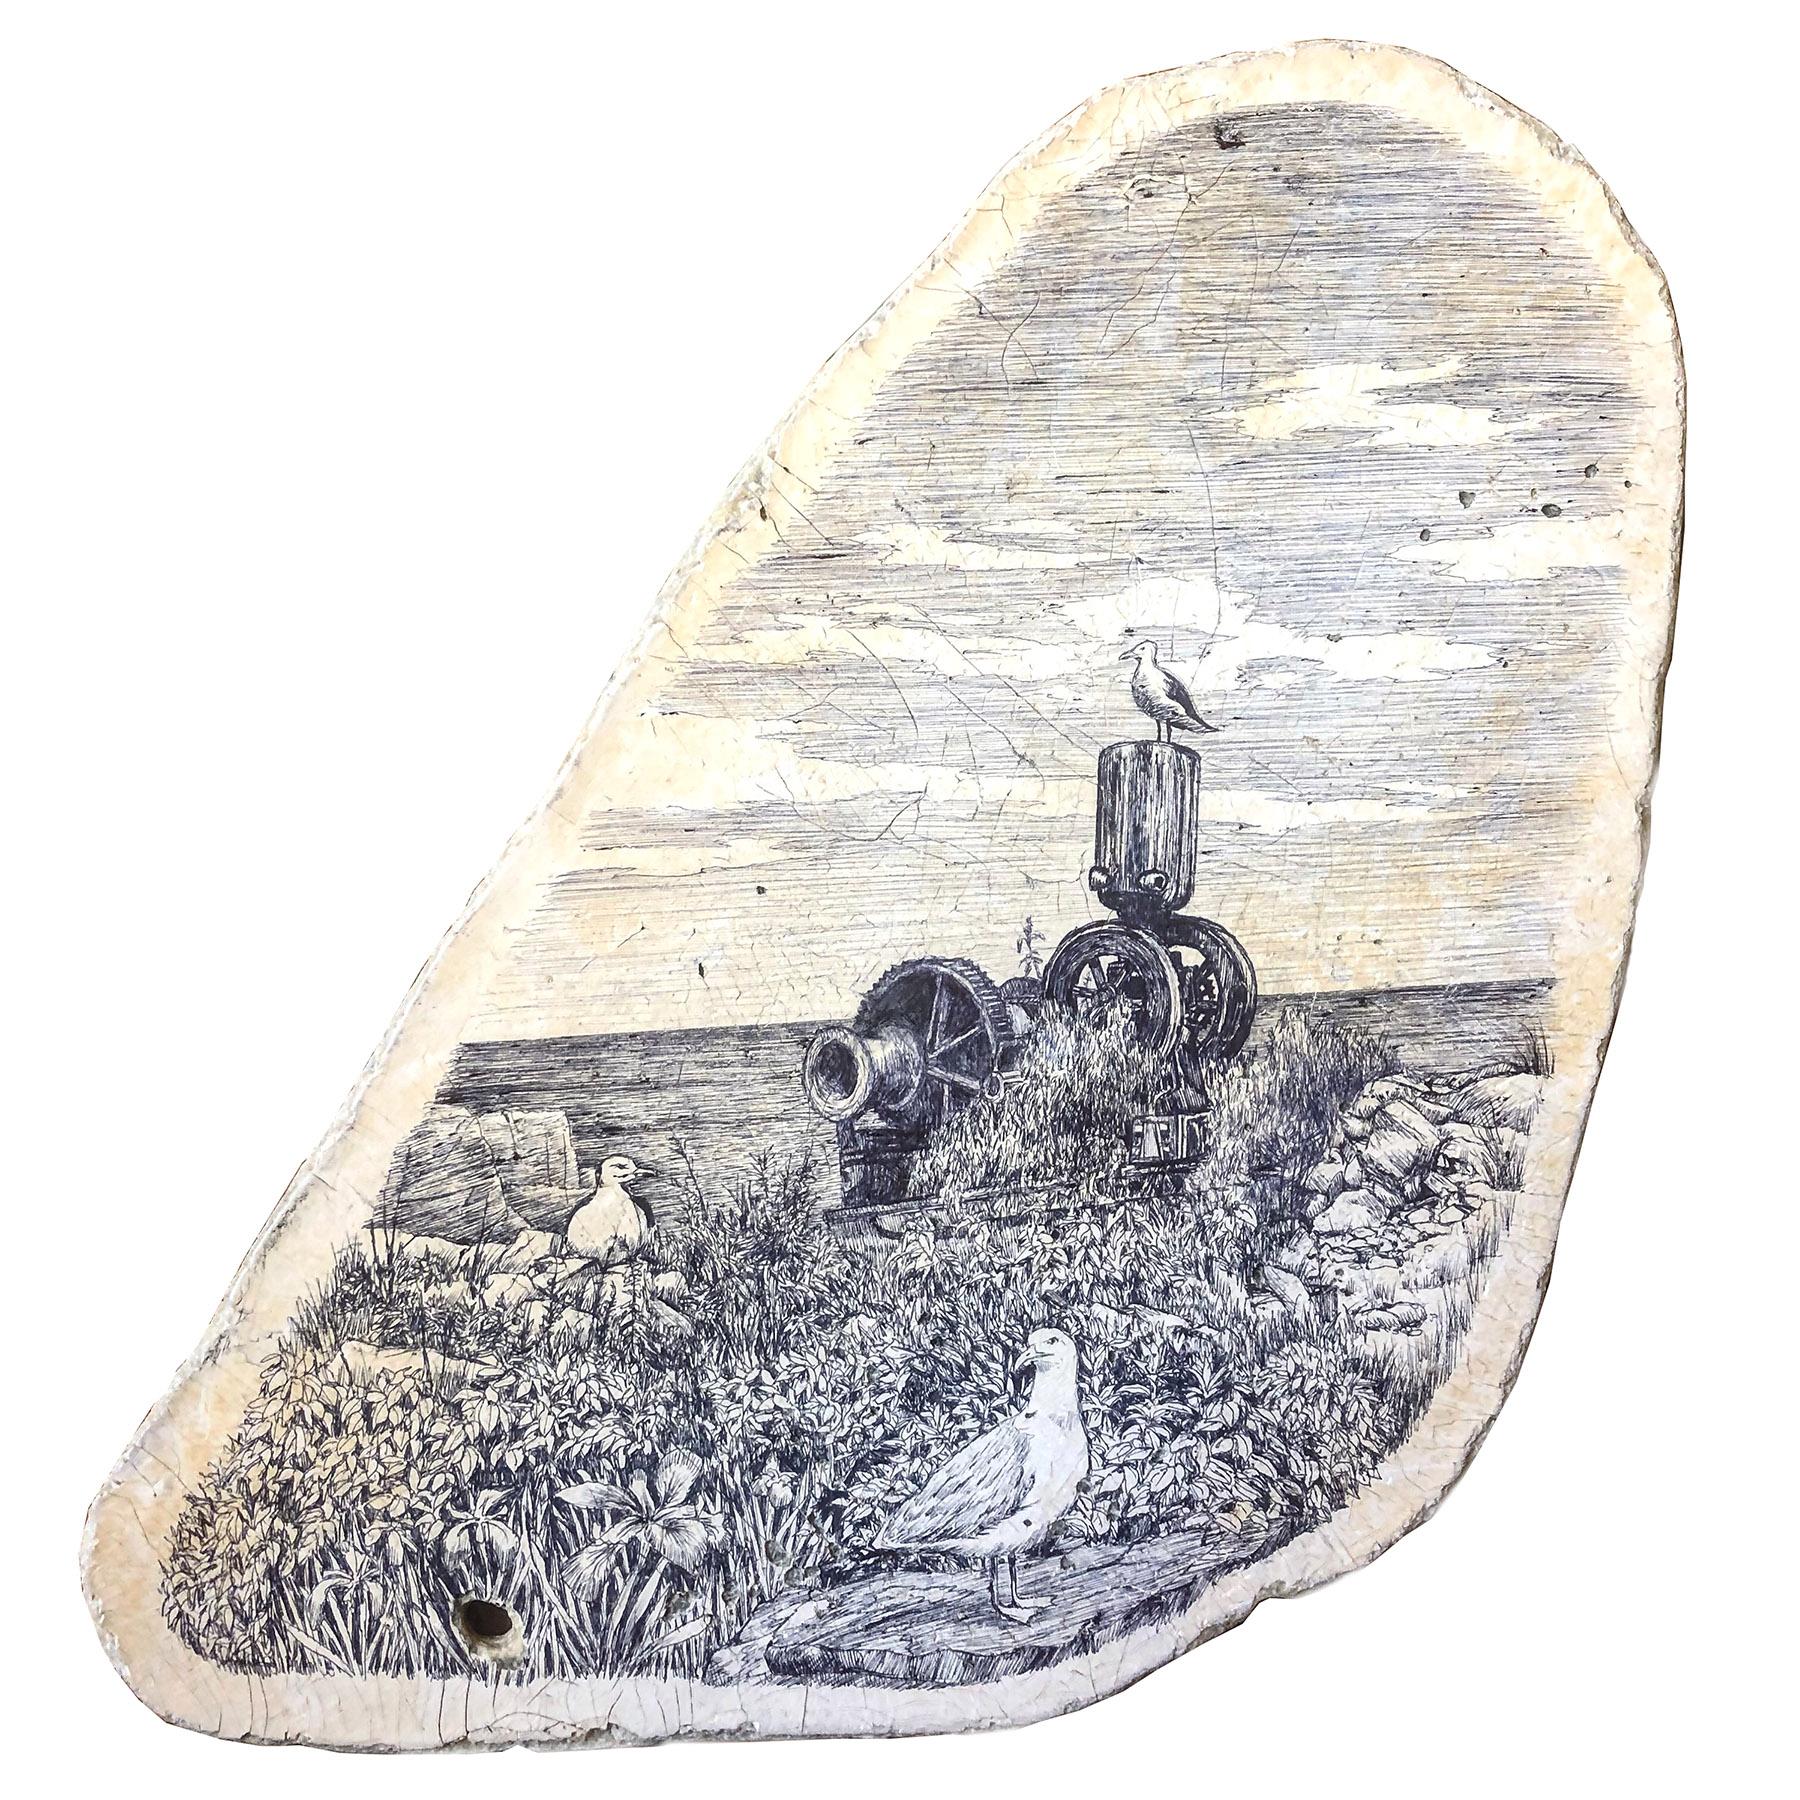 "Isle of Gulls    ballpoint pen on found fiberglass fragment  9.25"" x 10""  2019  (available)"